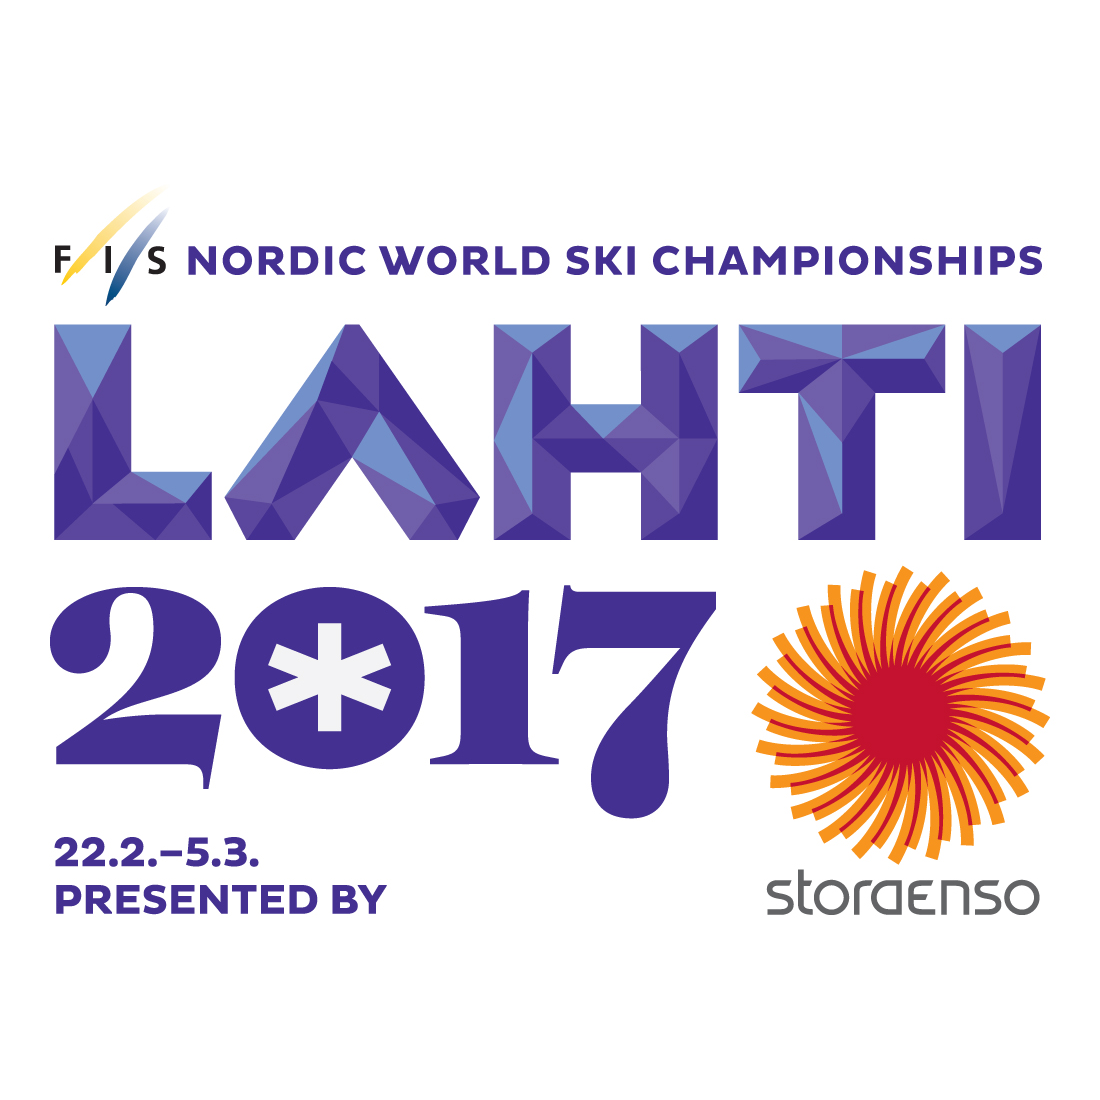 2017 FIS Nordic World Ski Championships